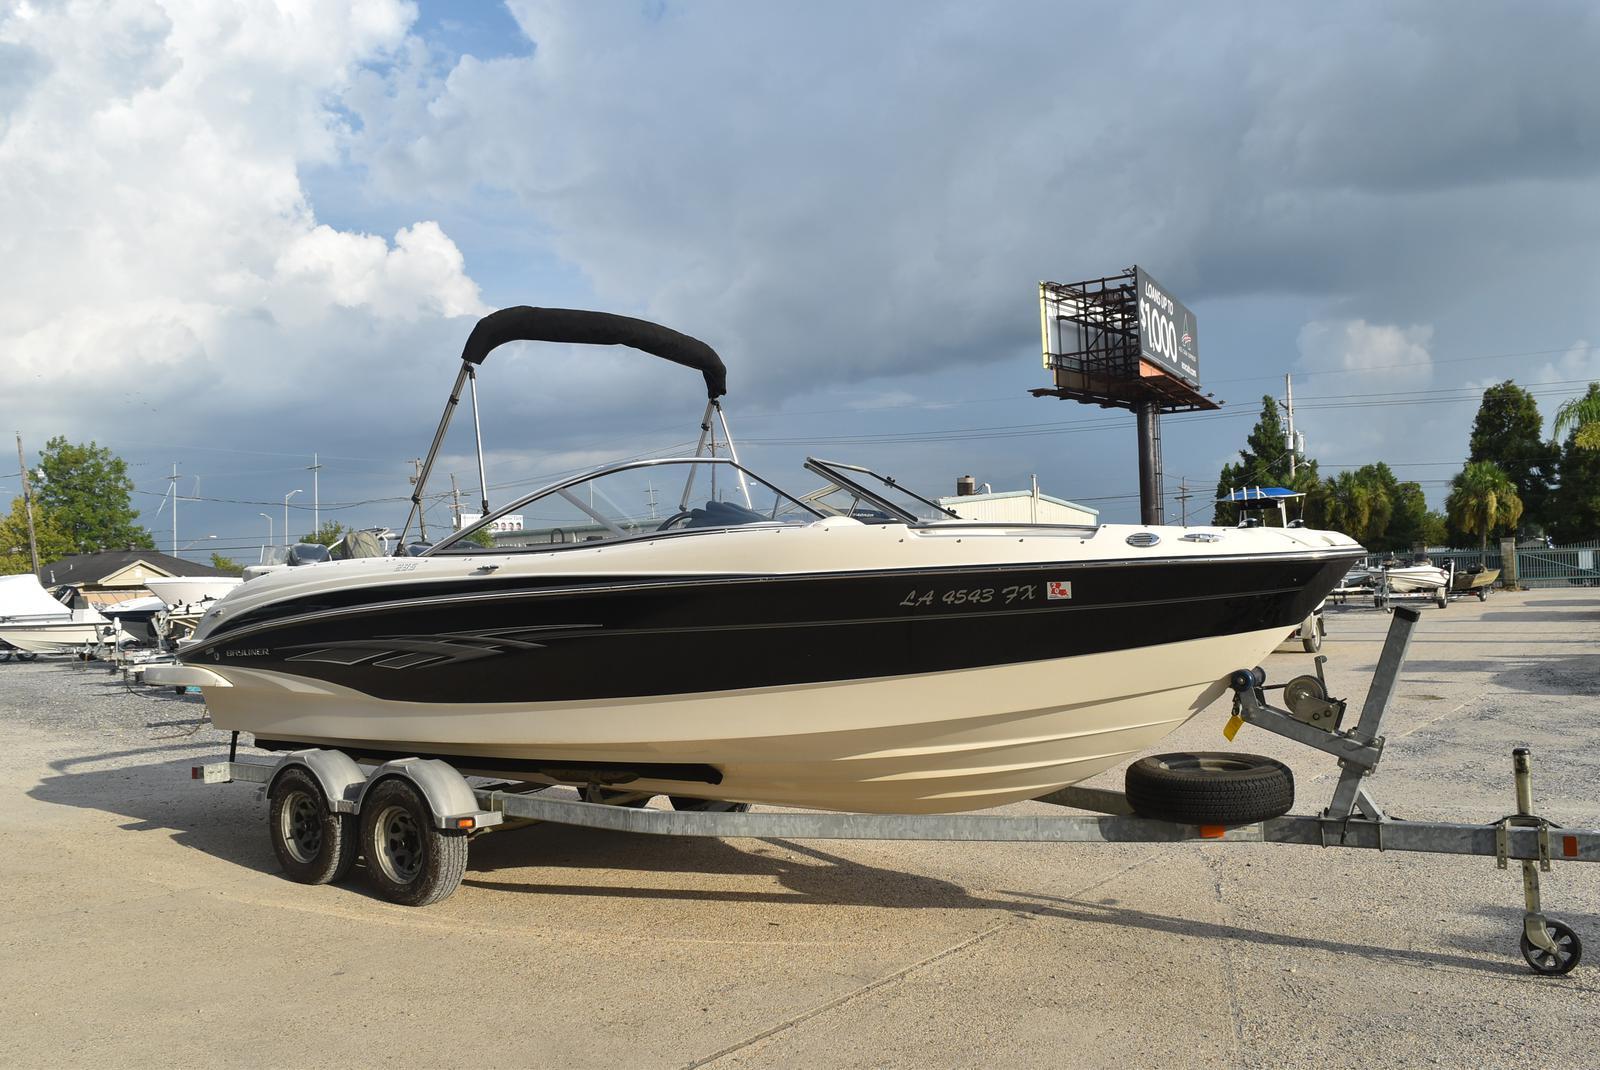 2010 Bayliner boat for sale, model of the boat is 235BR & Image # 38 of 43